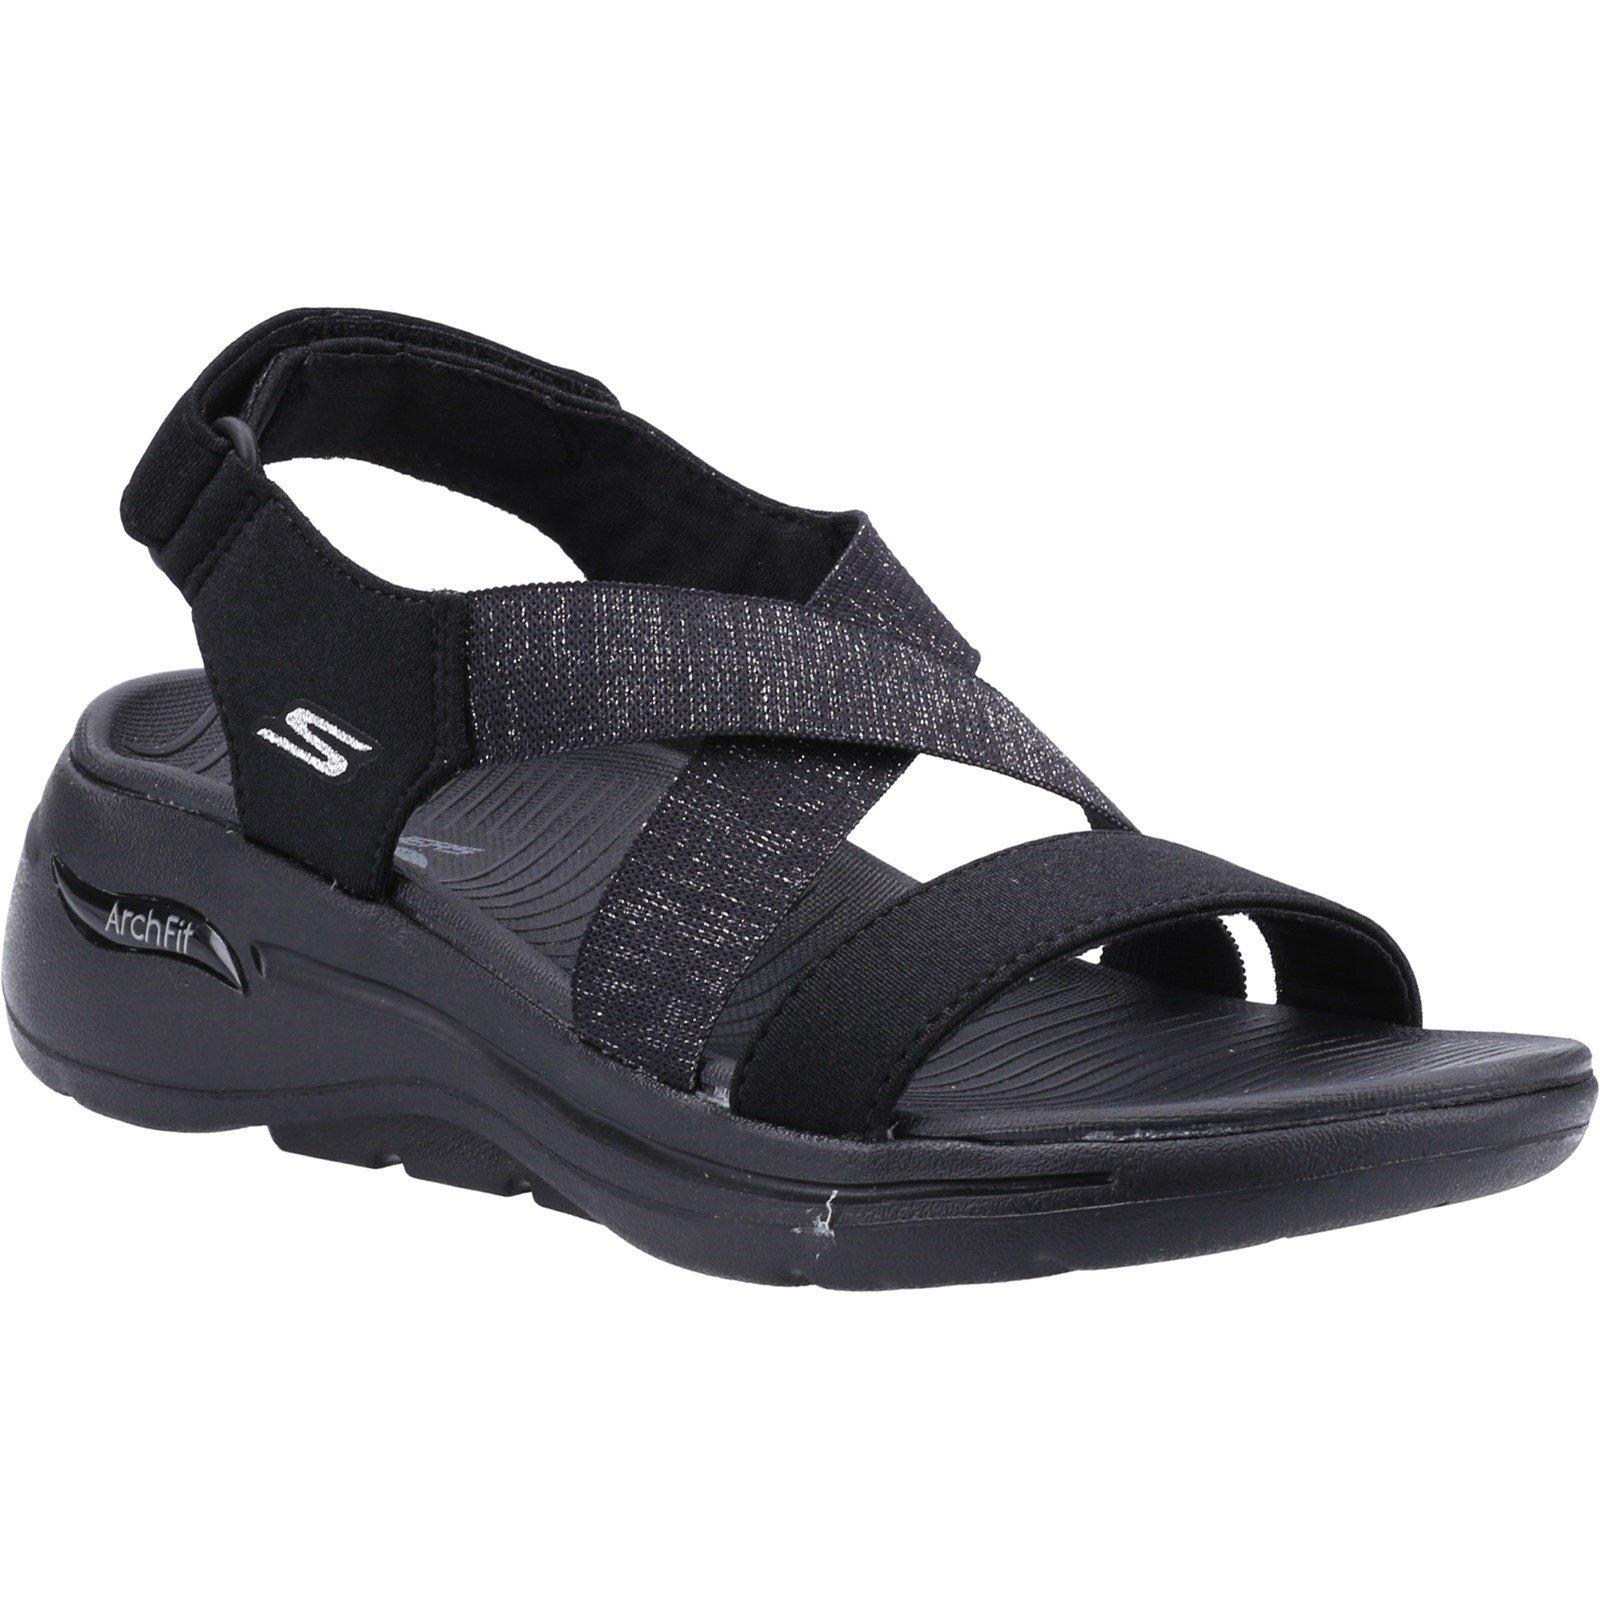 Skechers Women's Go Walk Arch Fit Astonish Summer Sandal Various Colours 32153 - Black 4